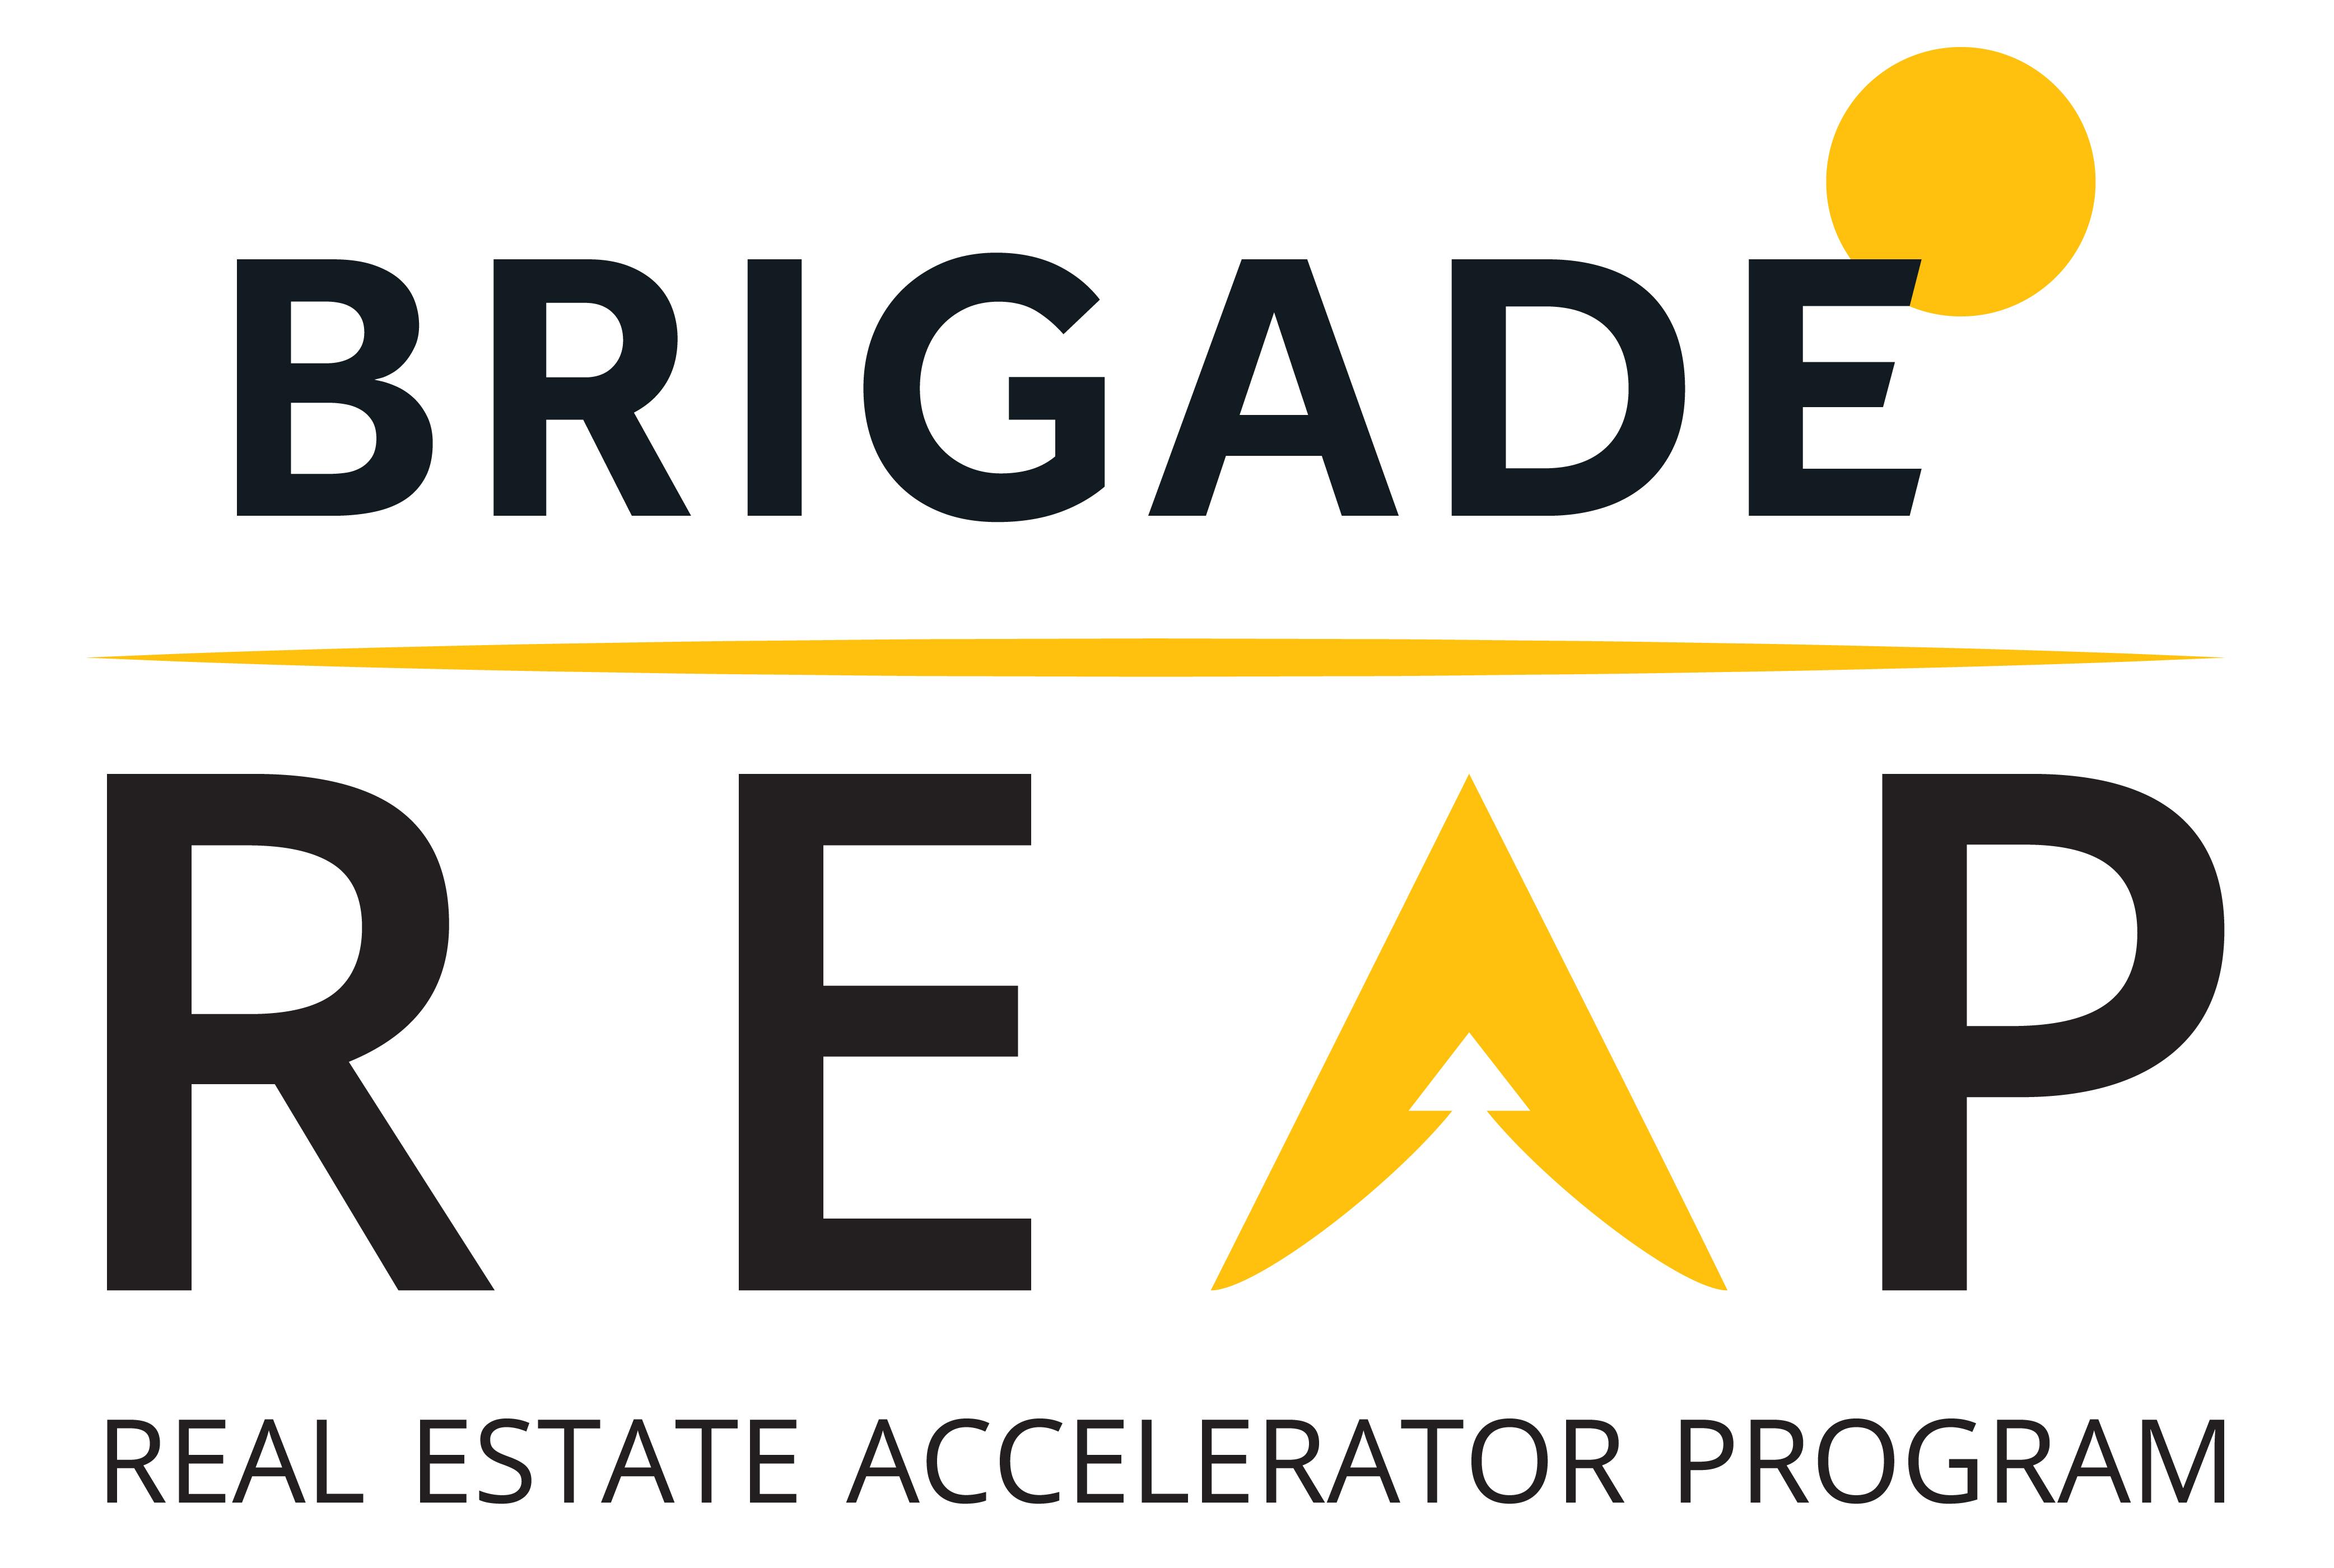 Brigade Real Estate Accelerator Program